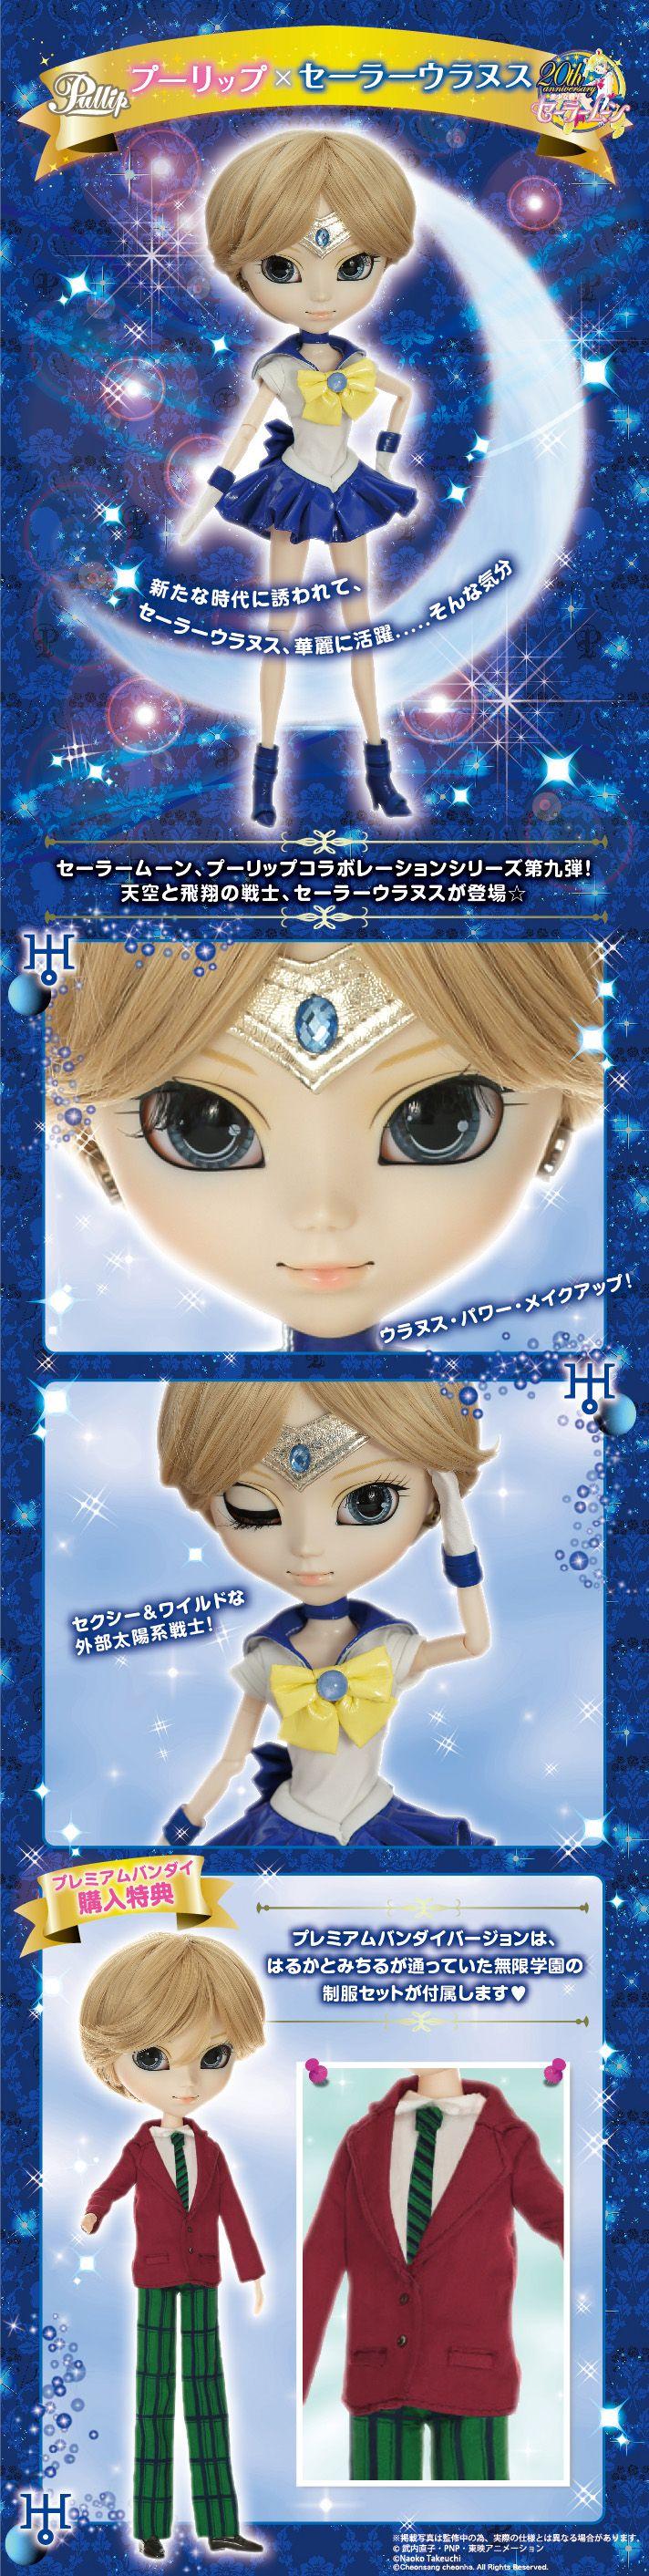 Pullip Sailor Uranus Premium Bandai Limited Edition. Sailor Moon rocks! - A Rinkya Blog